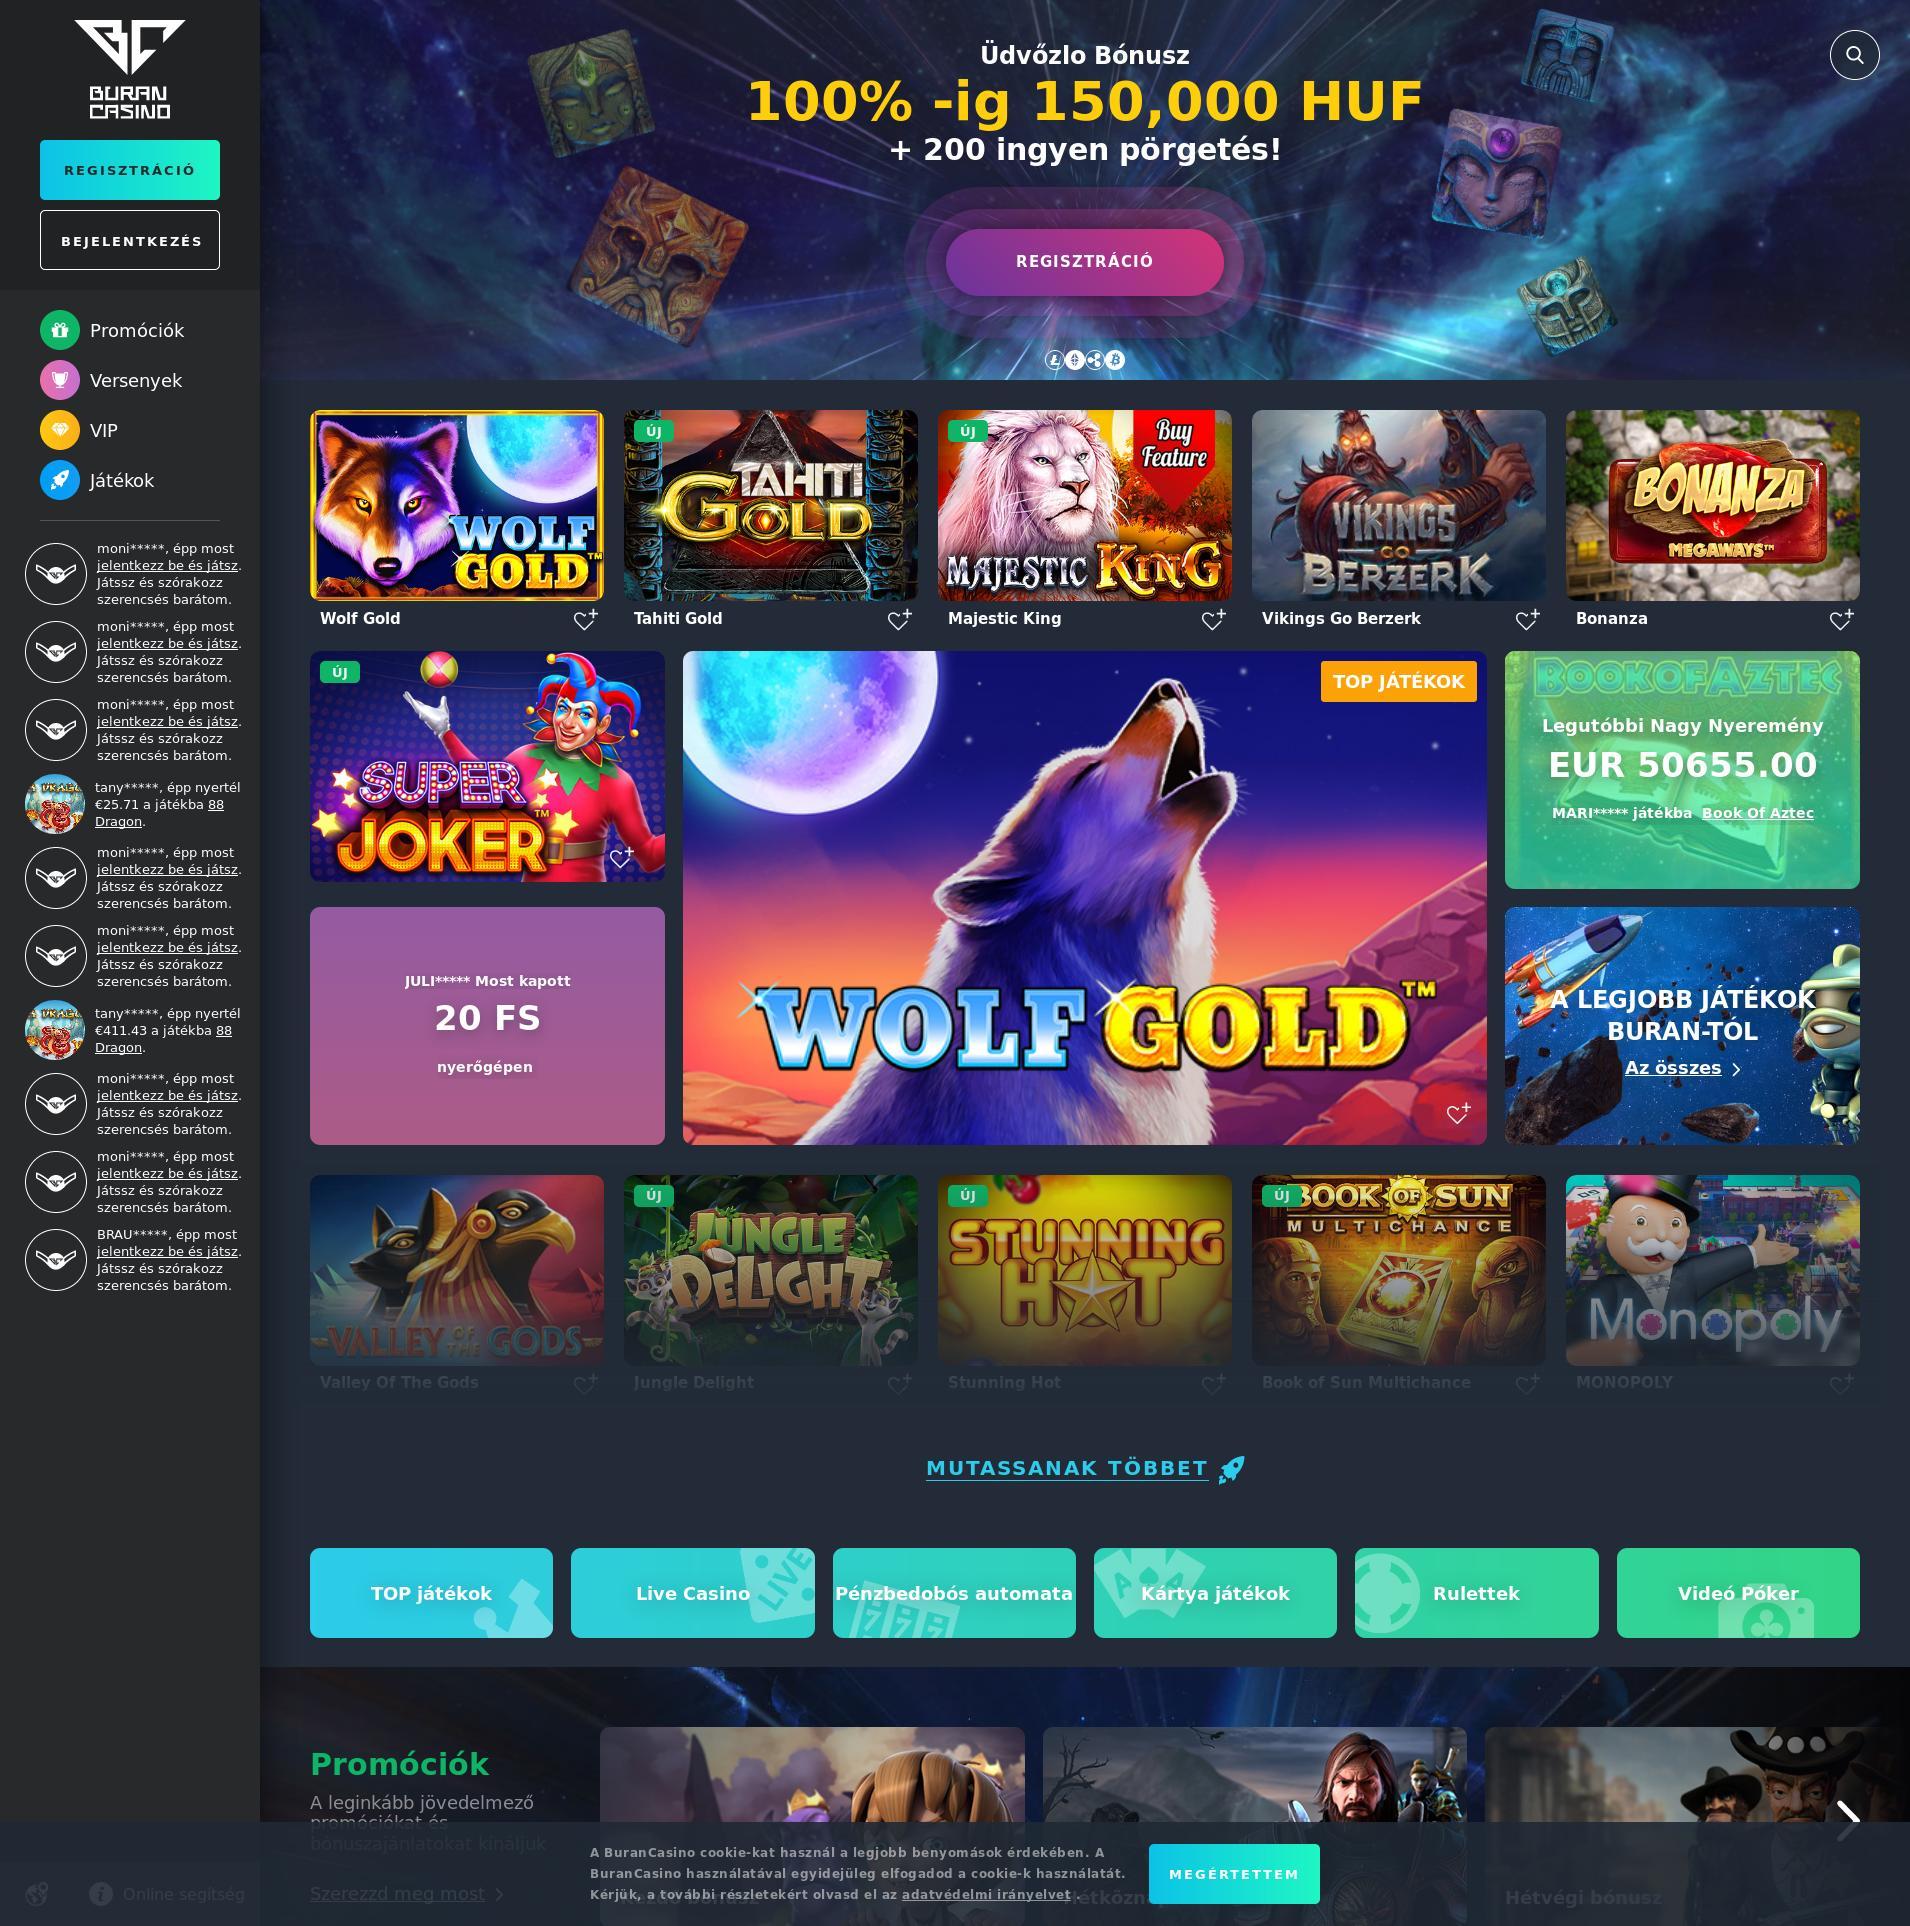 Casino screen Lobby 2019-09-18 for Hungary